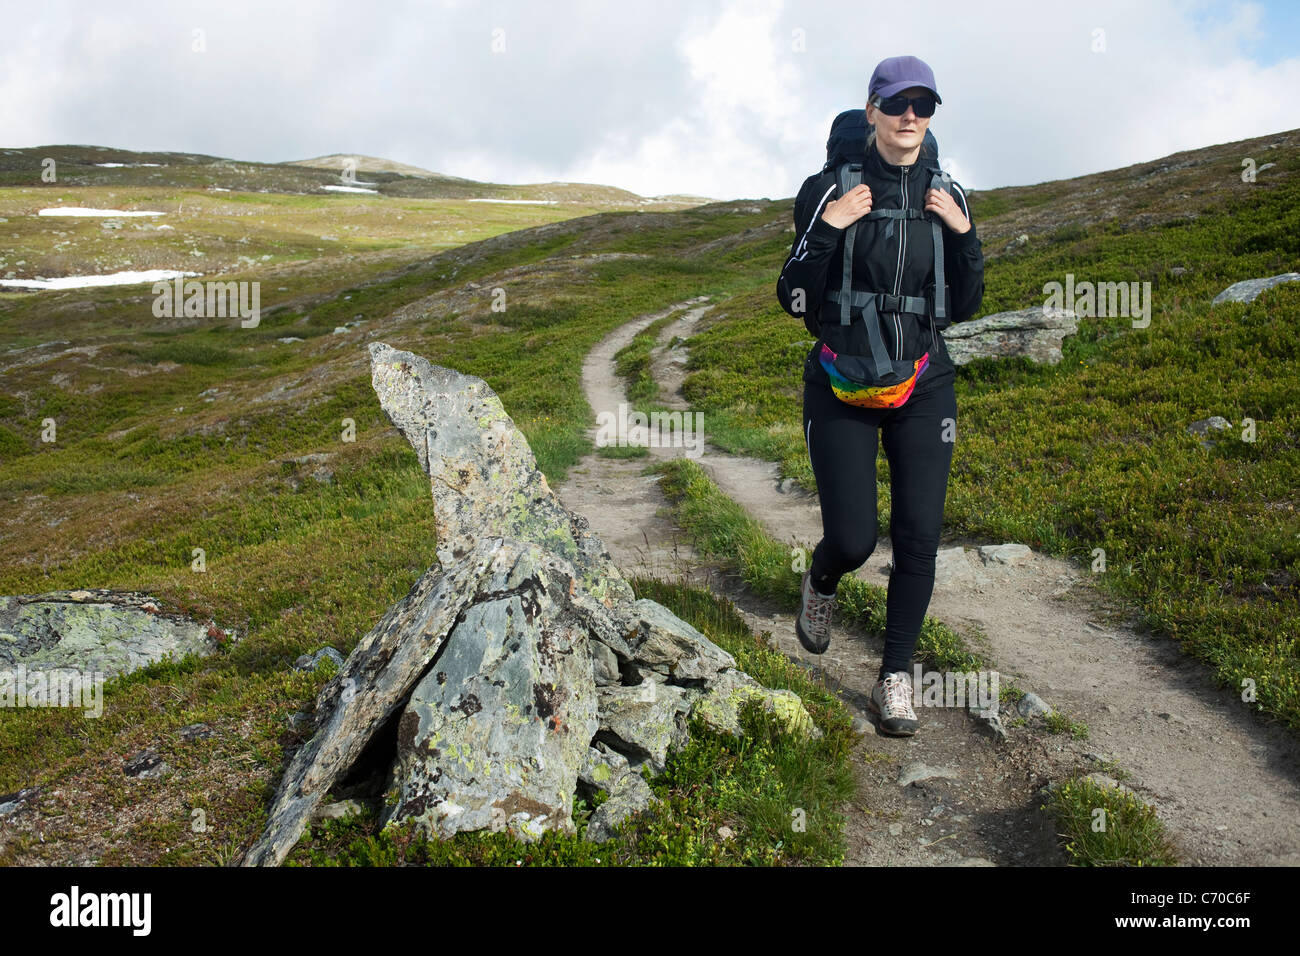 Hiker walking on dirt road - Stock Image